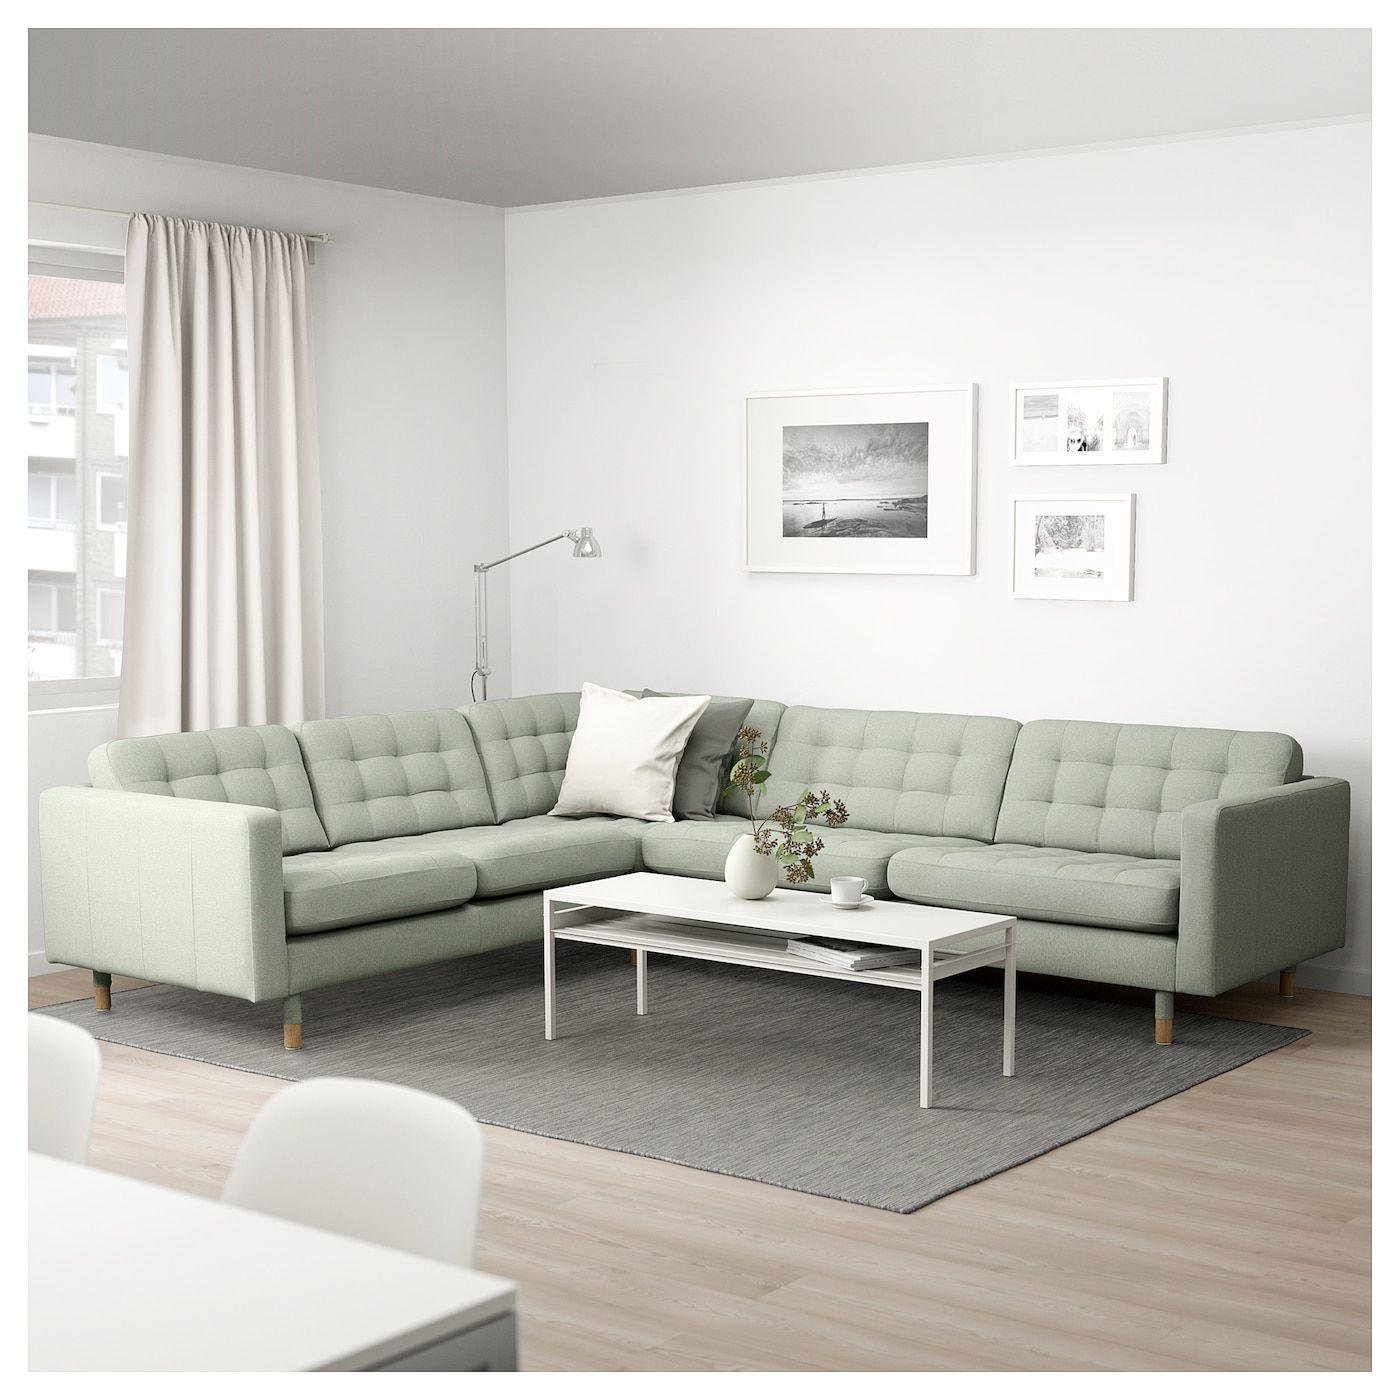 Landskrona Corner Sofa 5 Seat Gunnared Light Green Wood In 2020